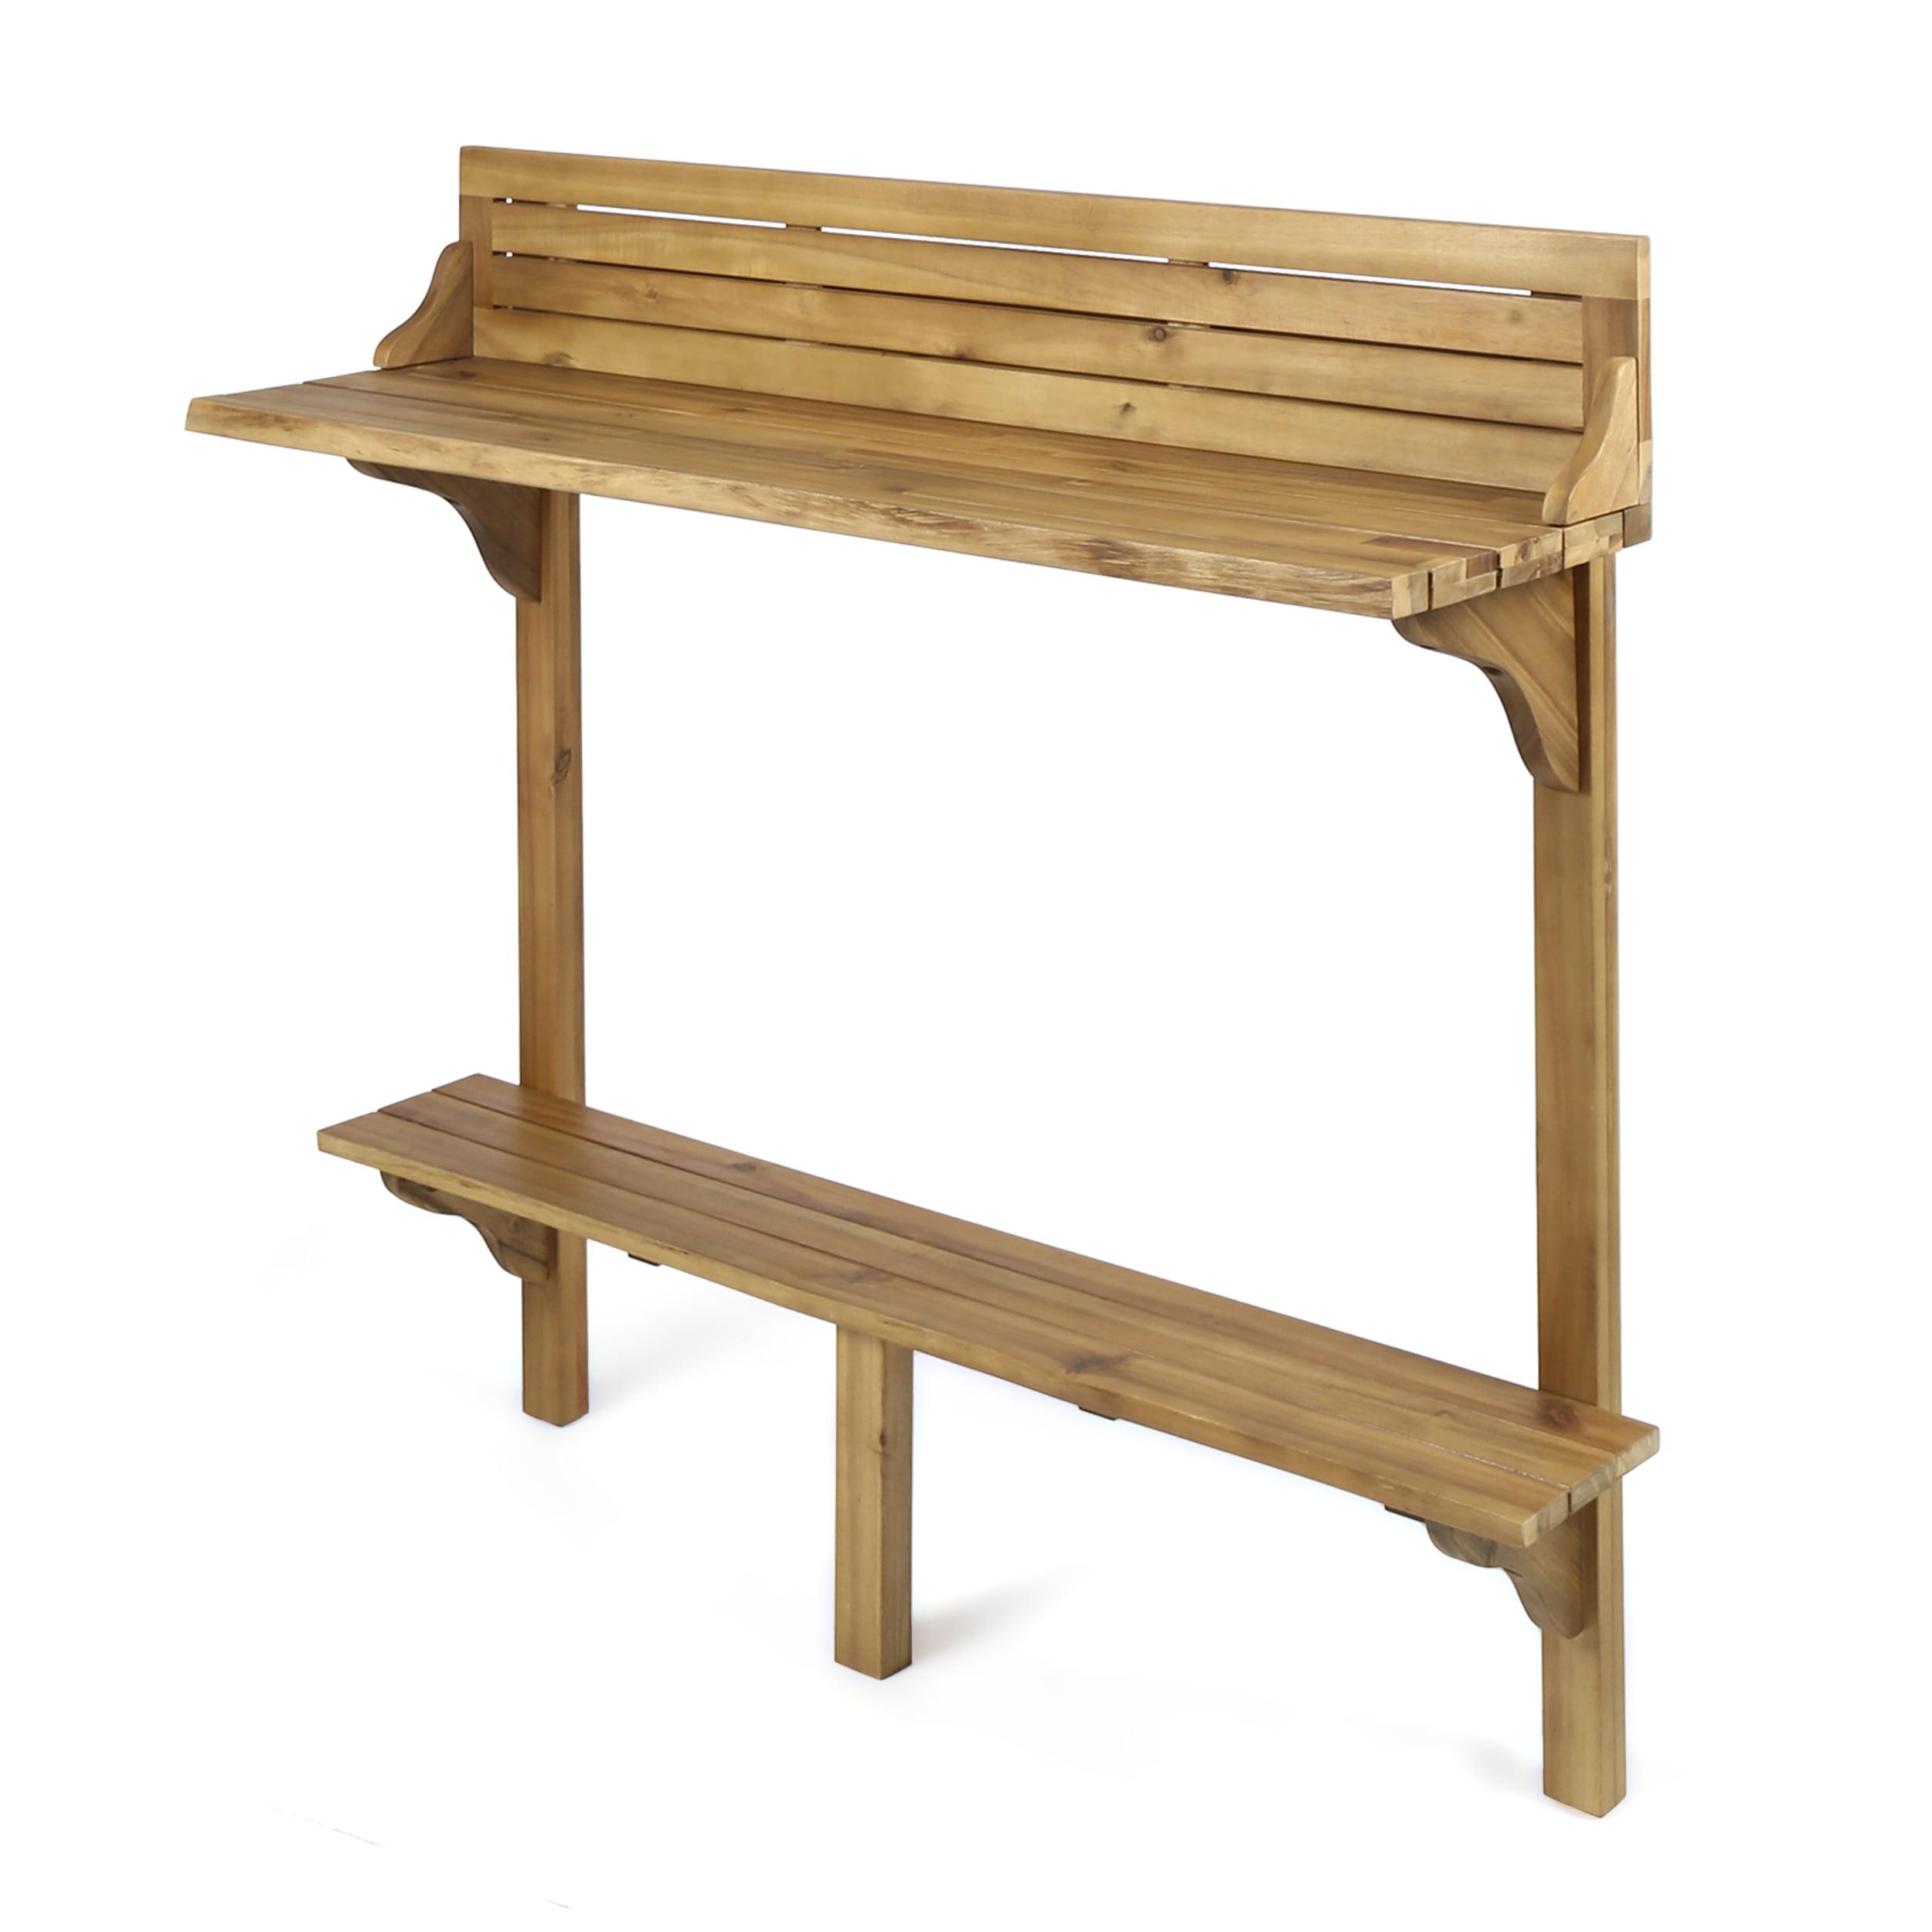 Cassie Outdoor Acacia Wood Balcony Bar Table, Natural Finish